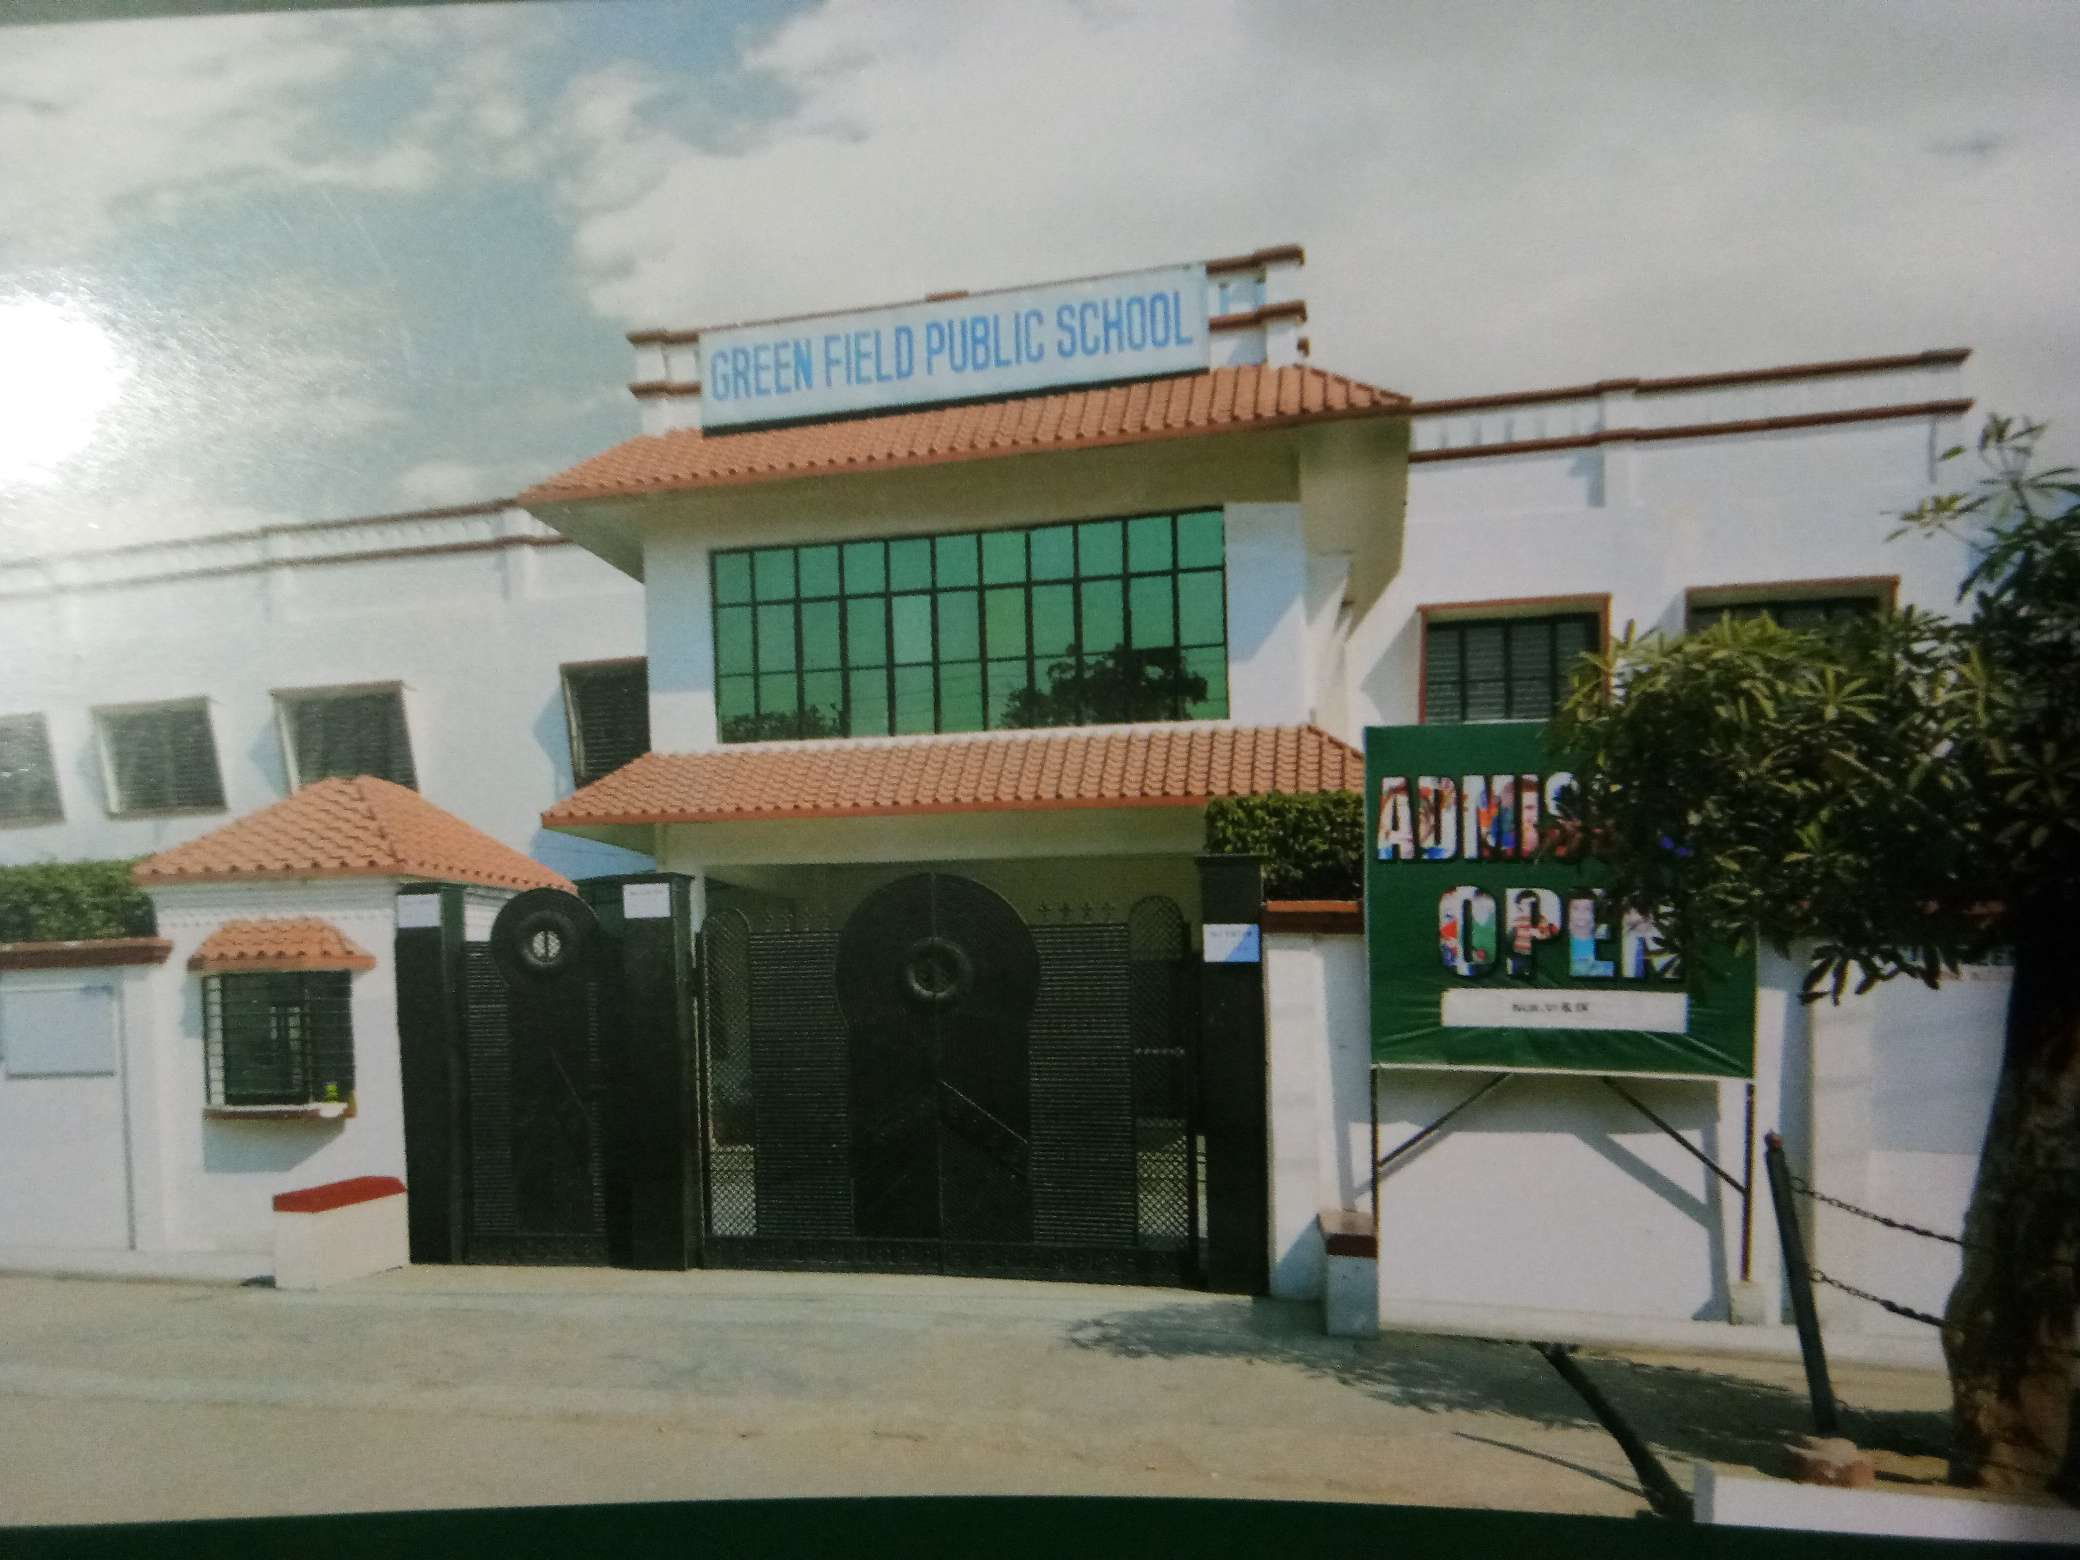 GREEN FIELD PUBLIC SCHOOL SECTOR 23 SANJAY NAGAR GHAZIABAD UTTAR PRADESH 2130252